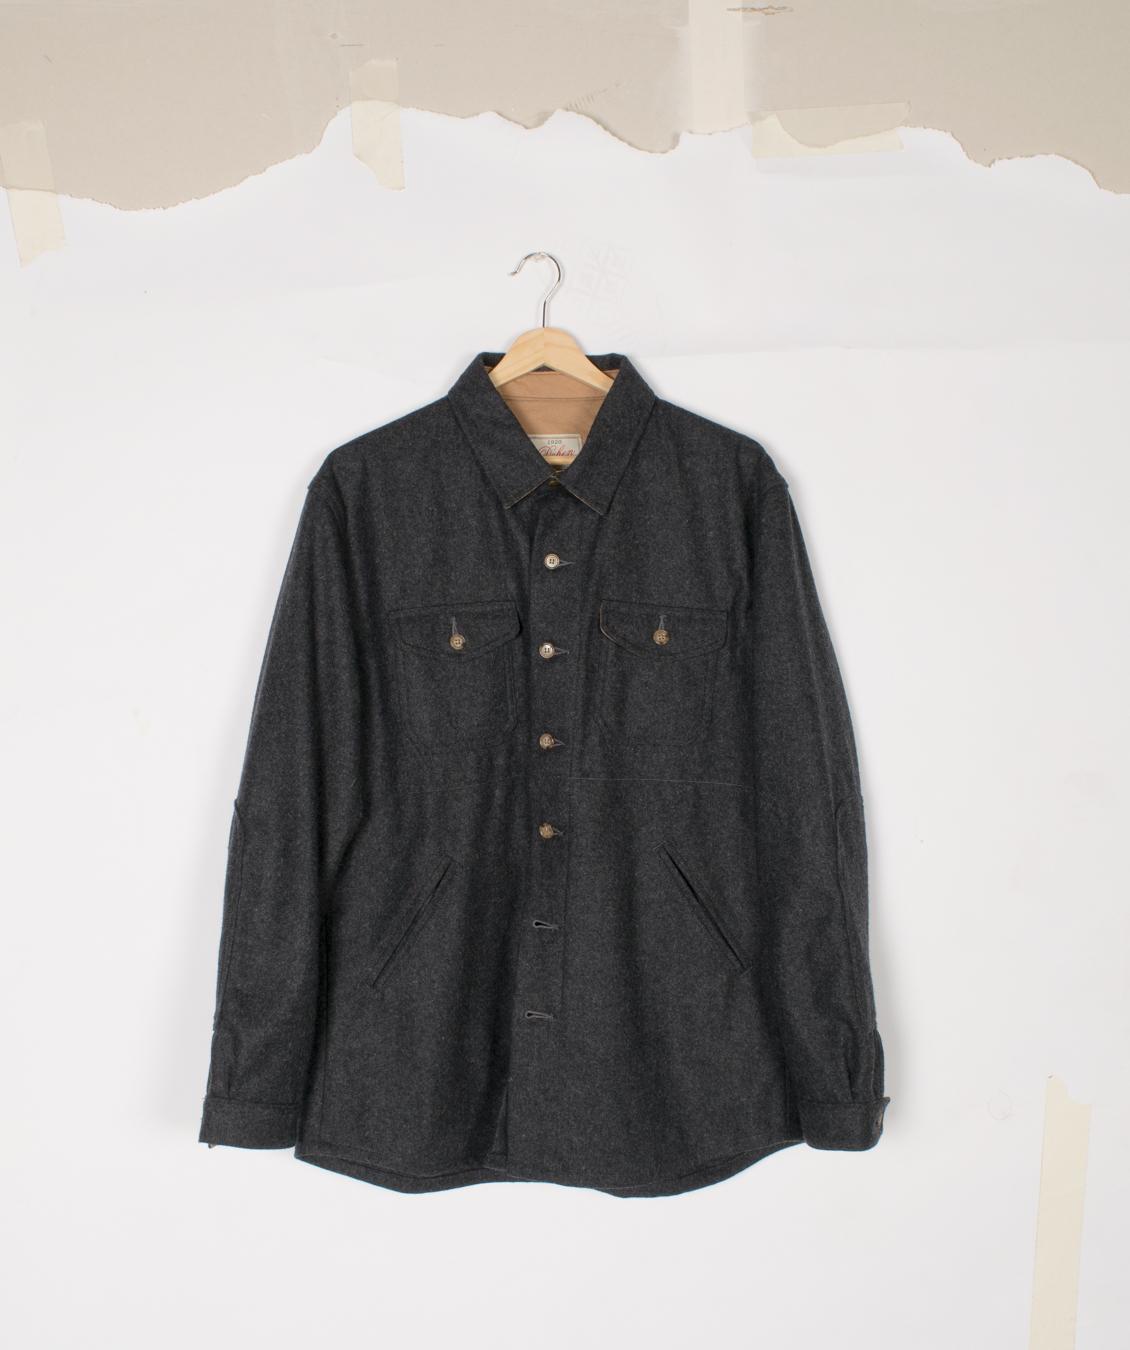 Crissman Overshirt - Charcoal - $145/$295